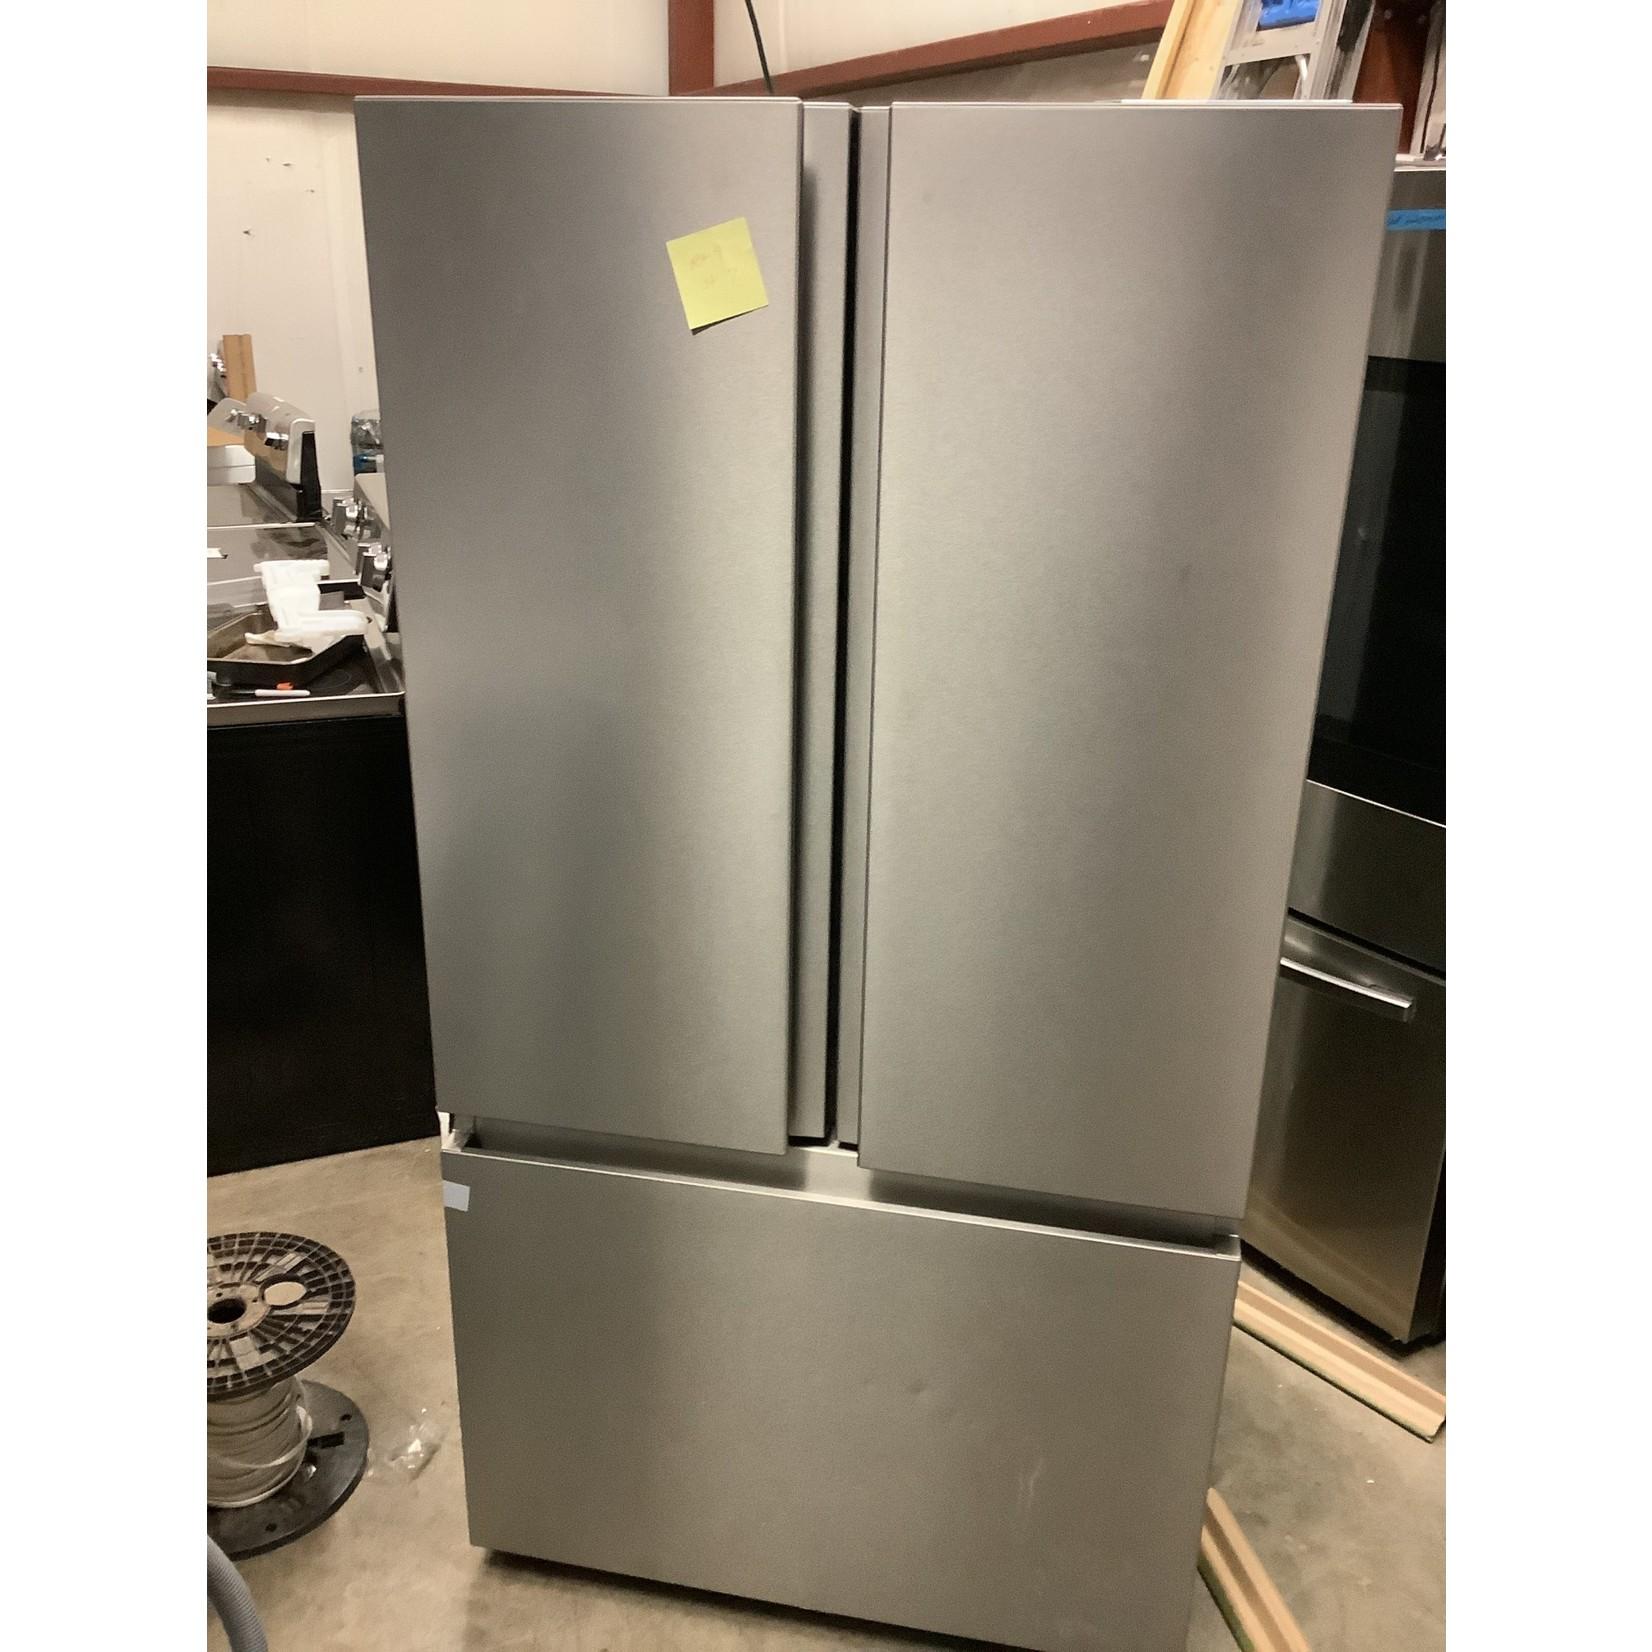 HISENSE Hisense refrigerator